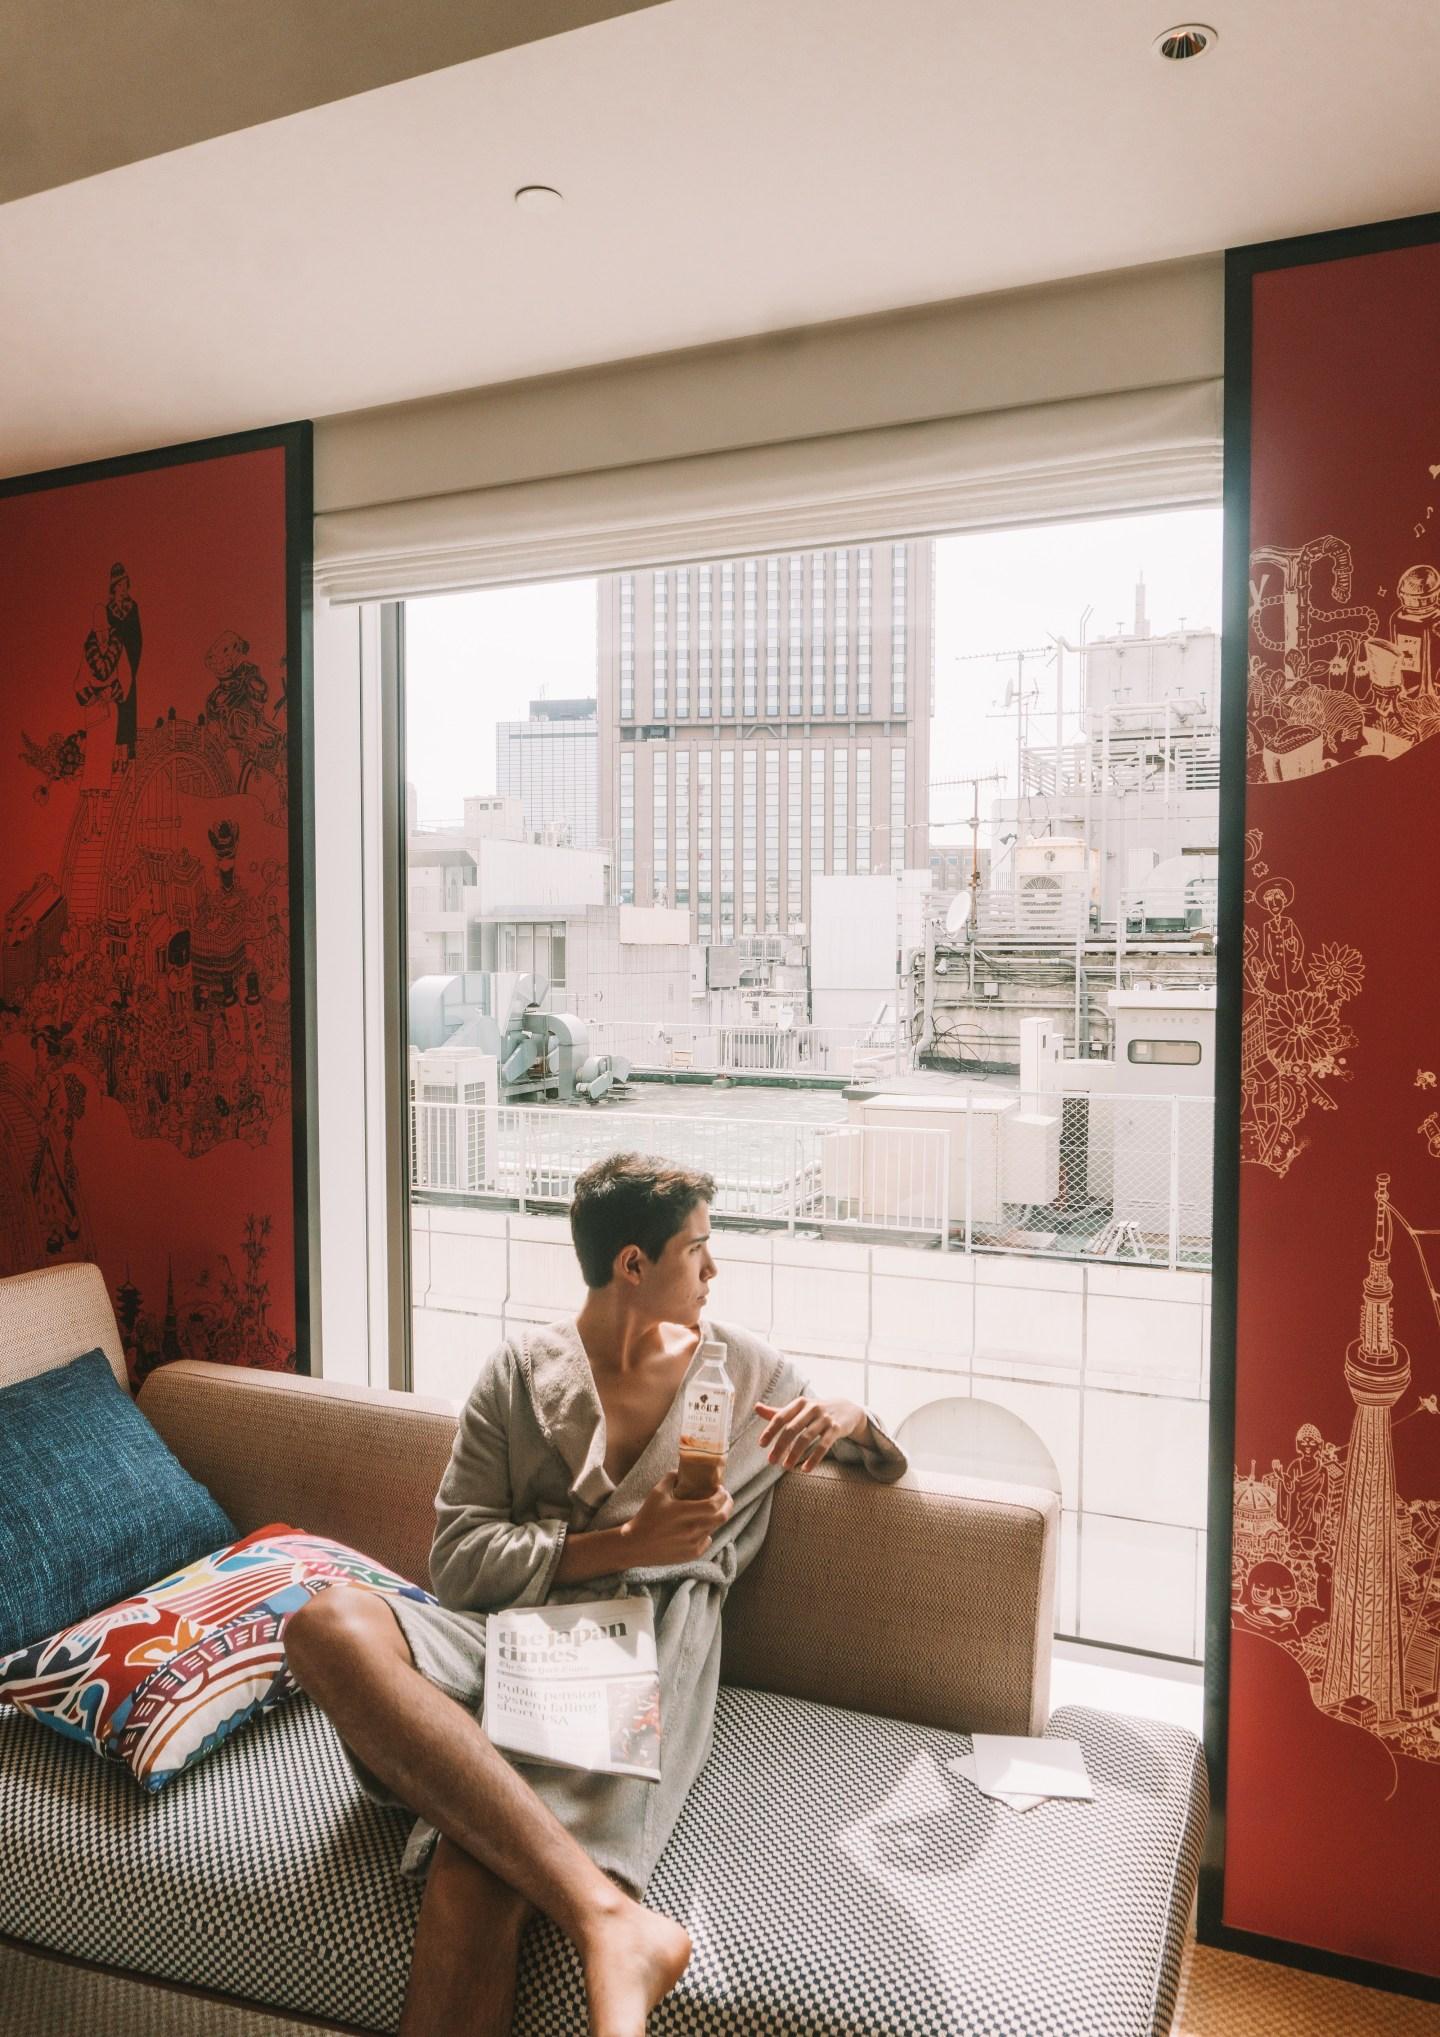 TOKYO: Hyatt Centric Ginza